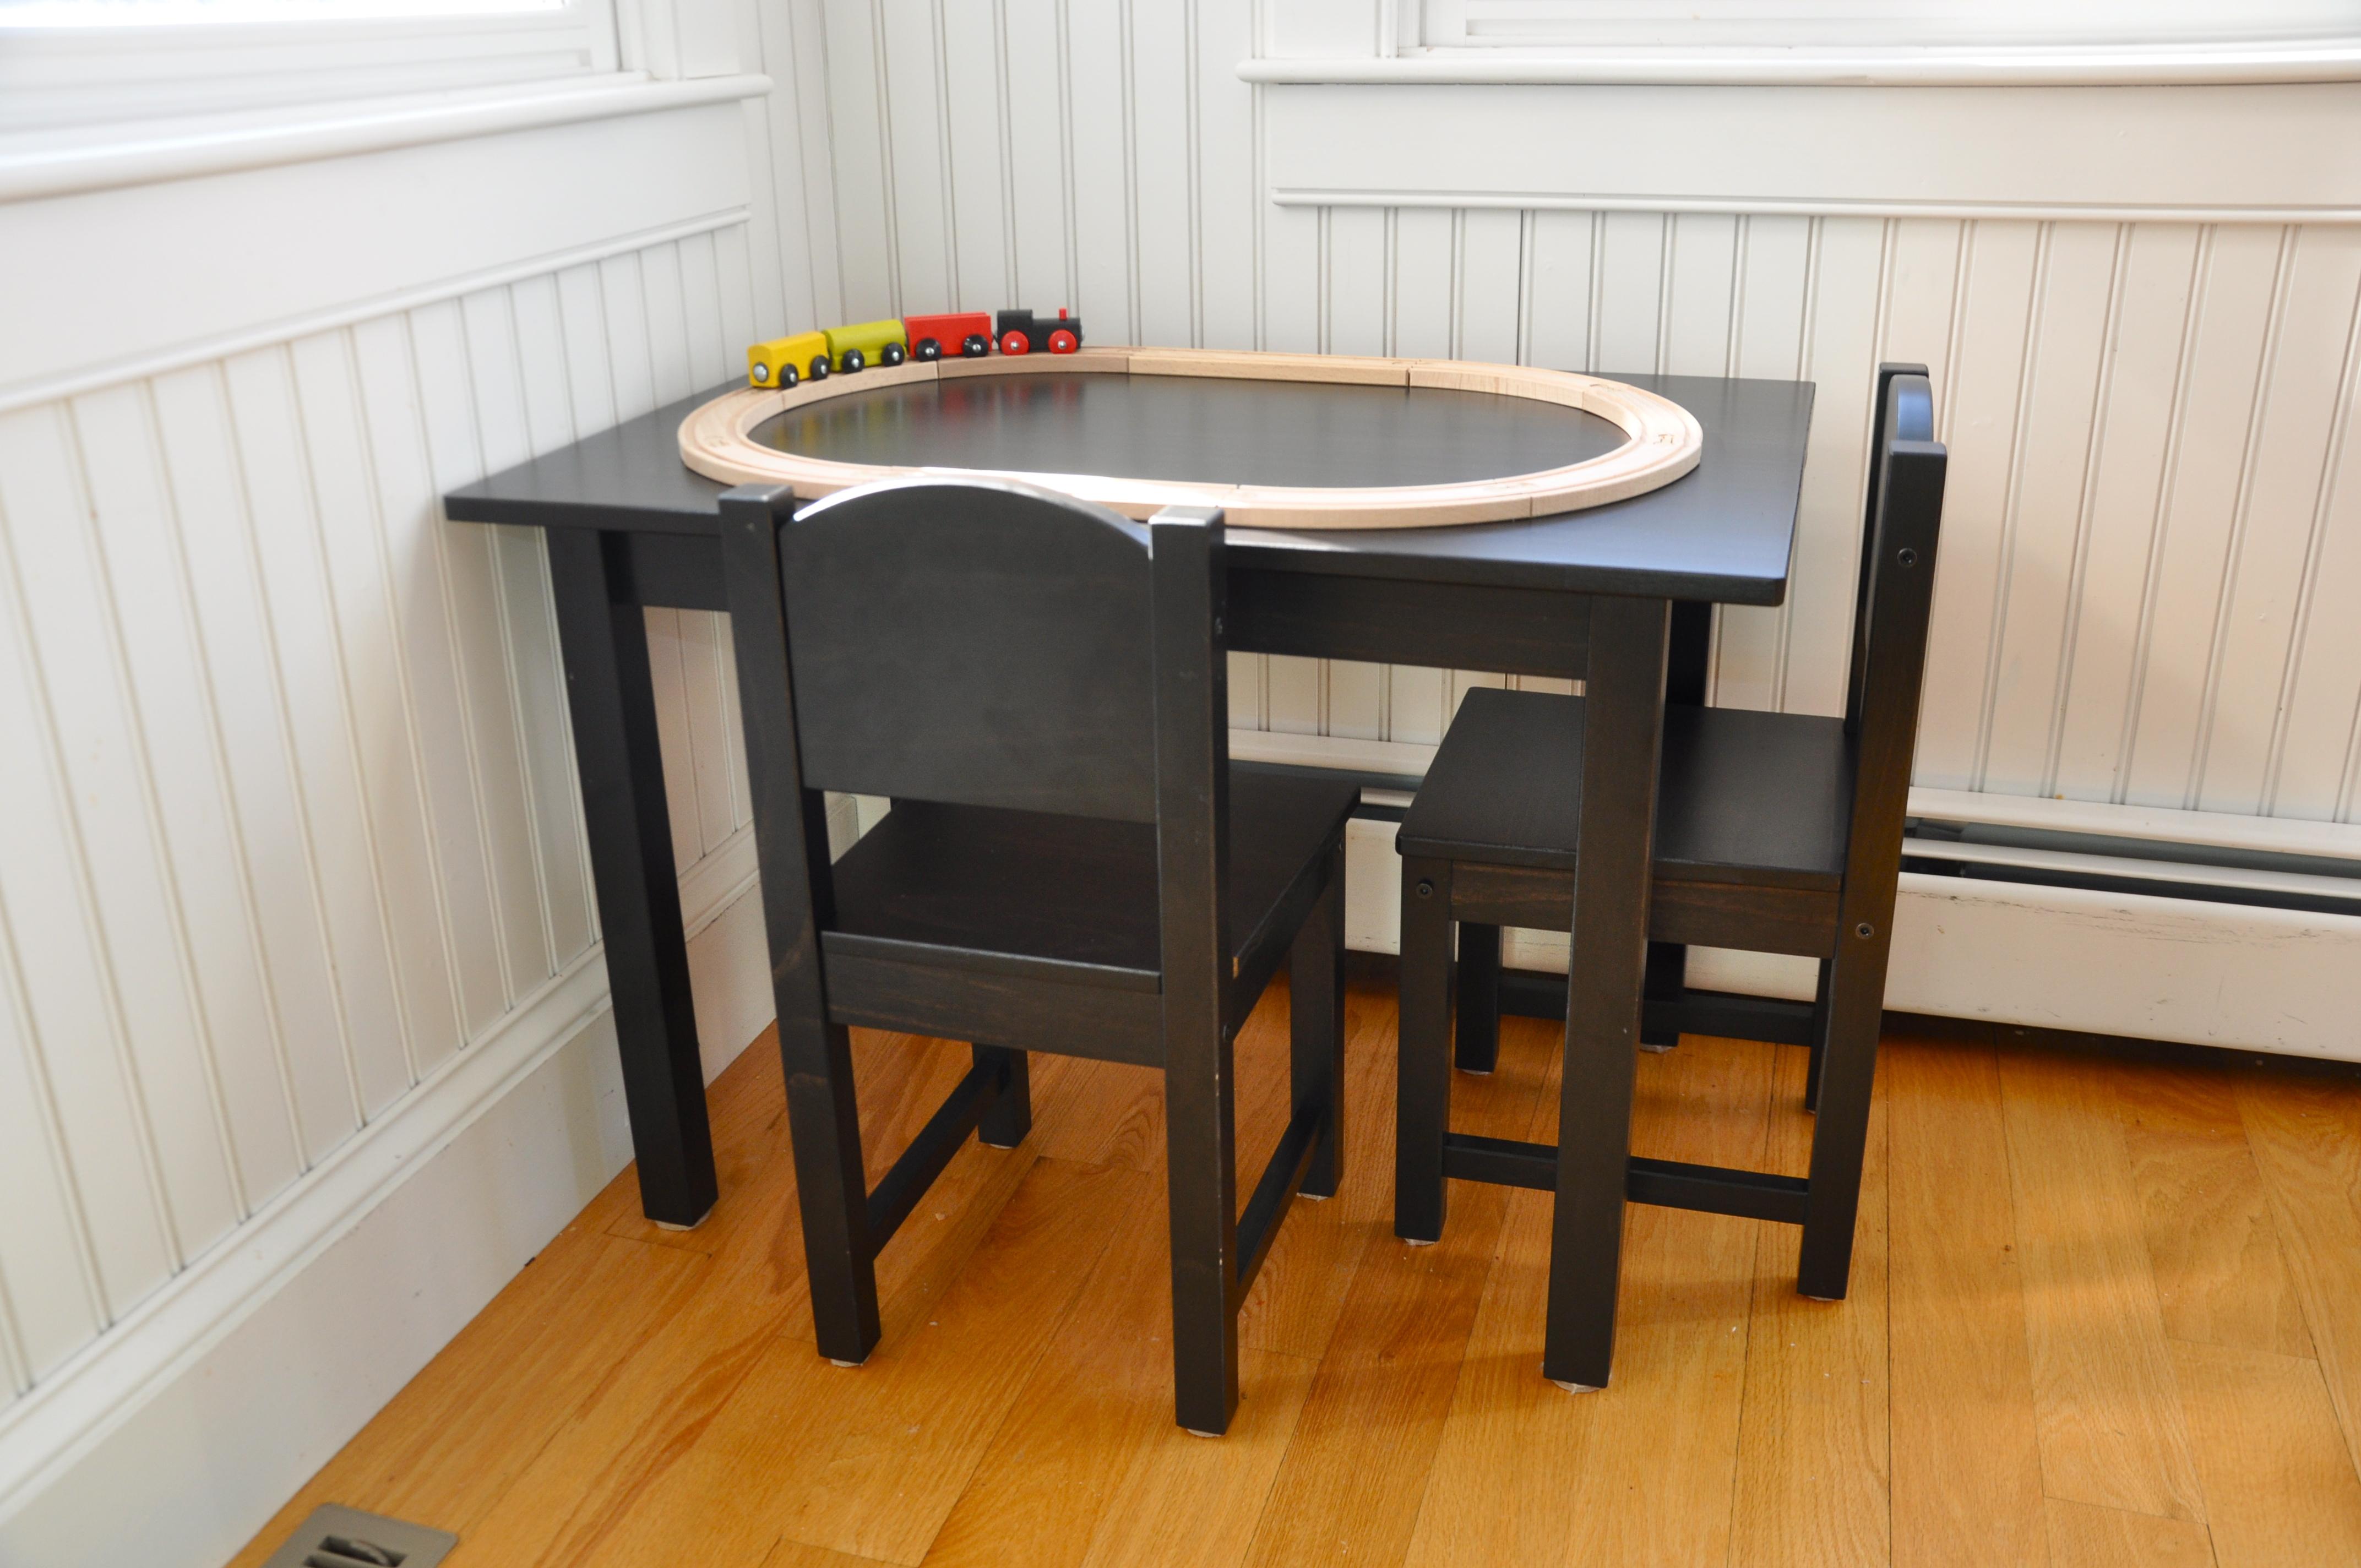 sundvik children 39 s table archives 2 sisters 2 cities. Black Bedroom Furniture Sets. Home Design Ideas